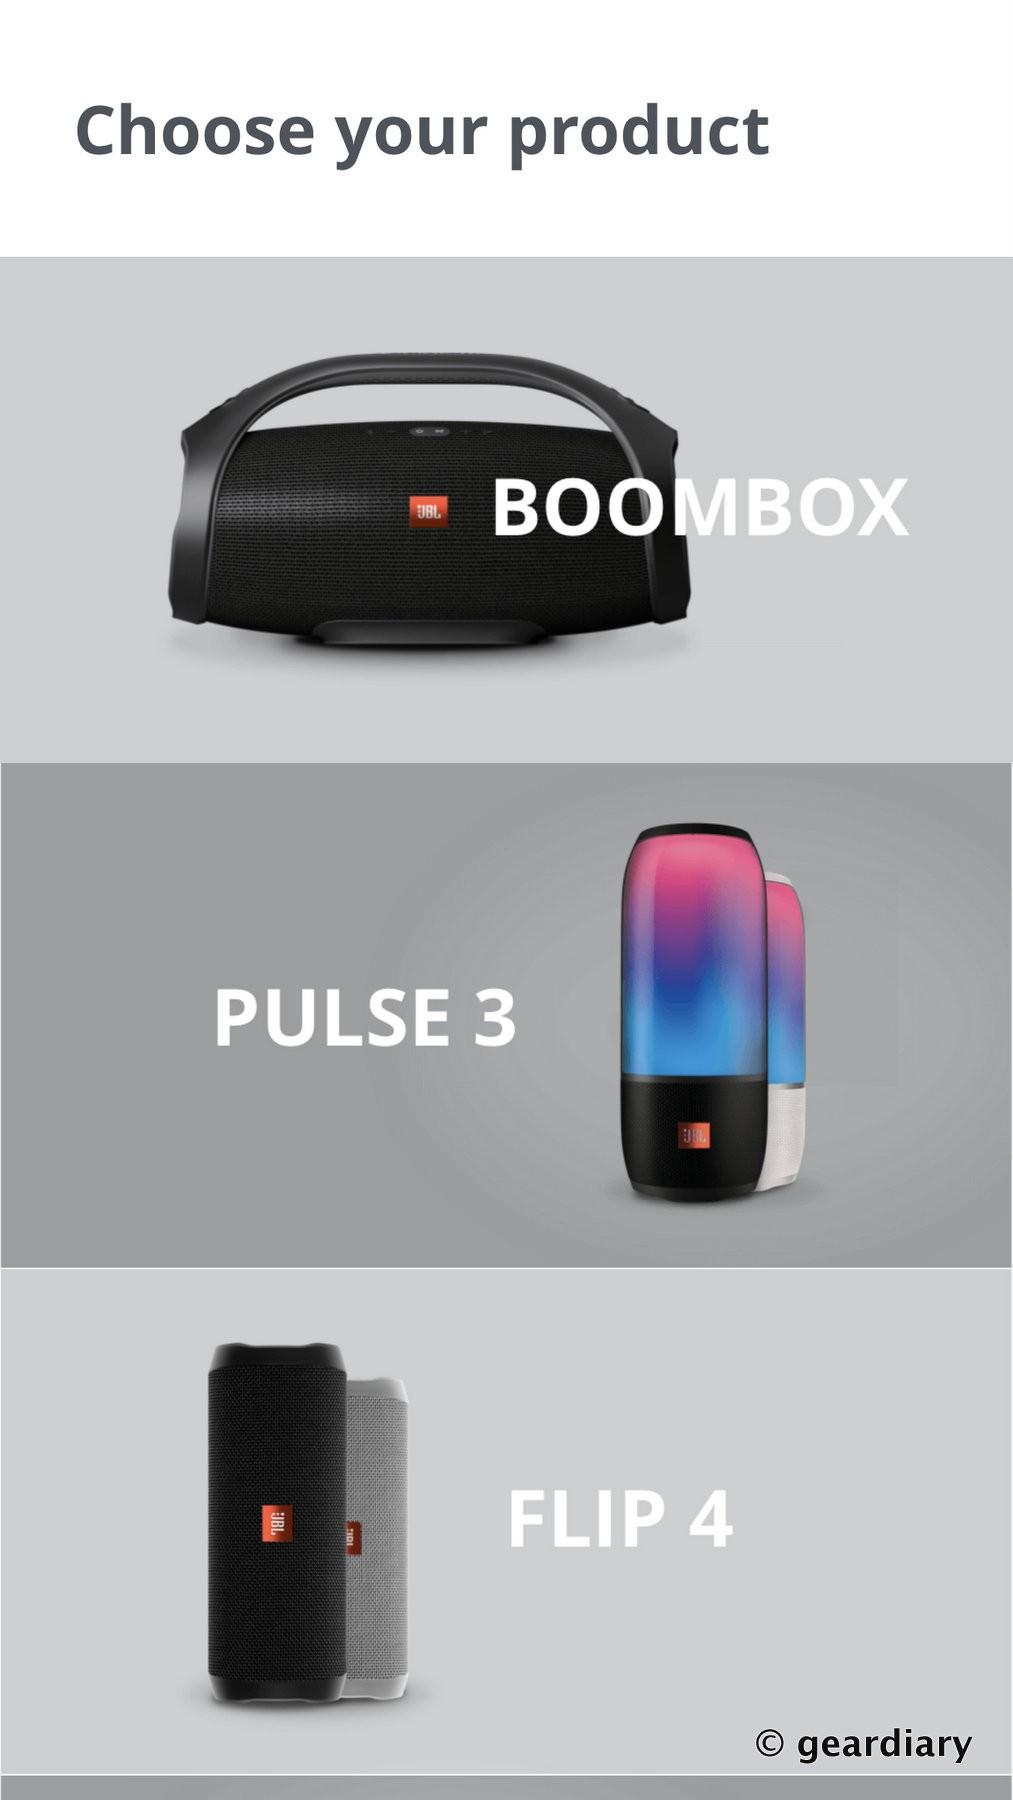 JBL Pulse 3 Portable Bluetooth Speaker: A Grown-Up Lava Lamp